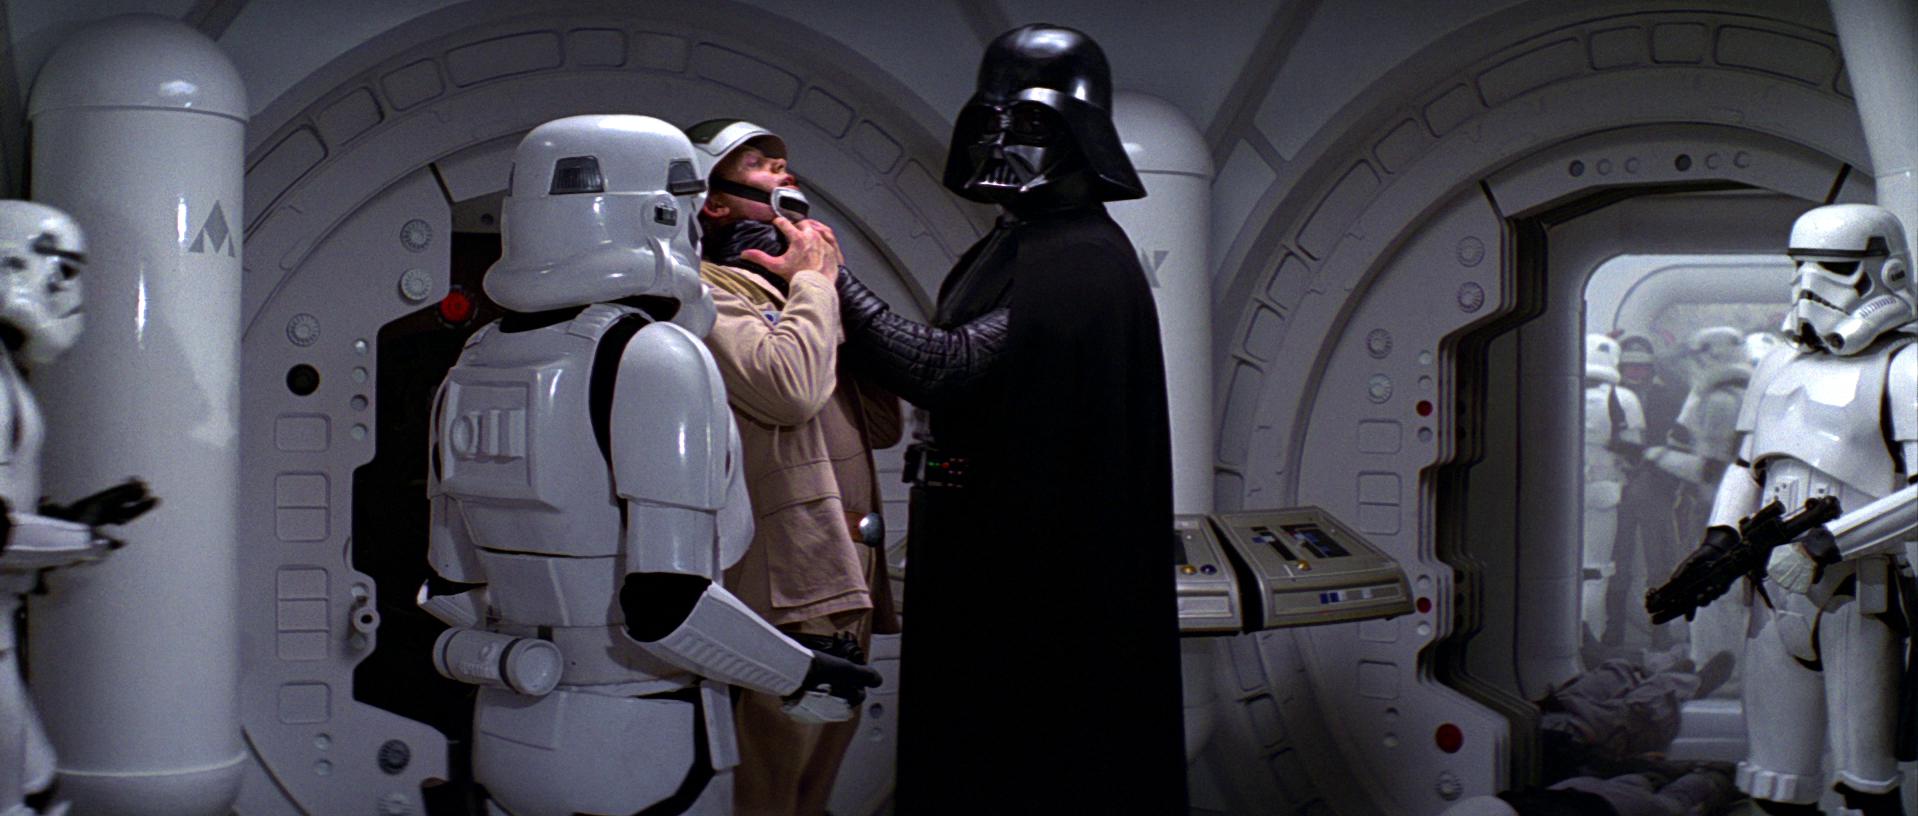 Unidentified Stormtrooper Commander Tantive Iv